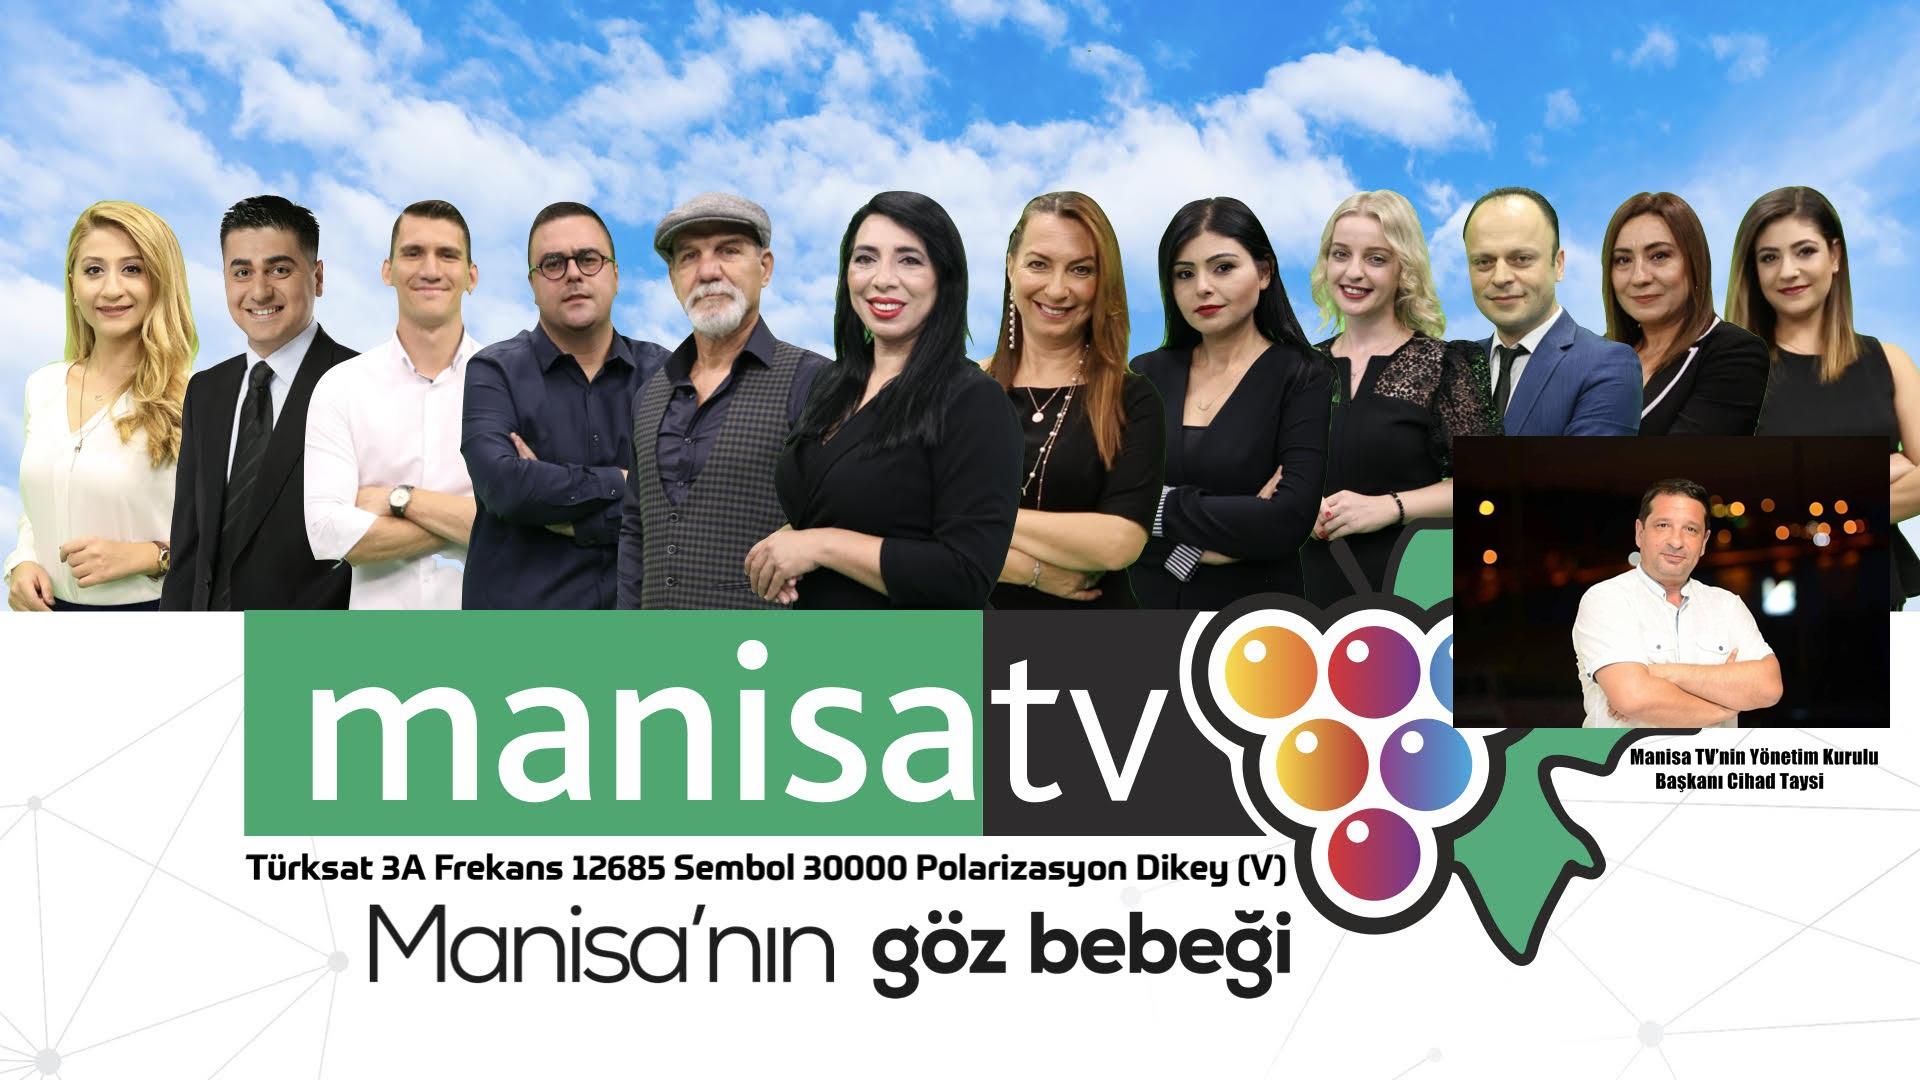 MANİSA TV YAYIN HAYATINA BAŞLADI.